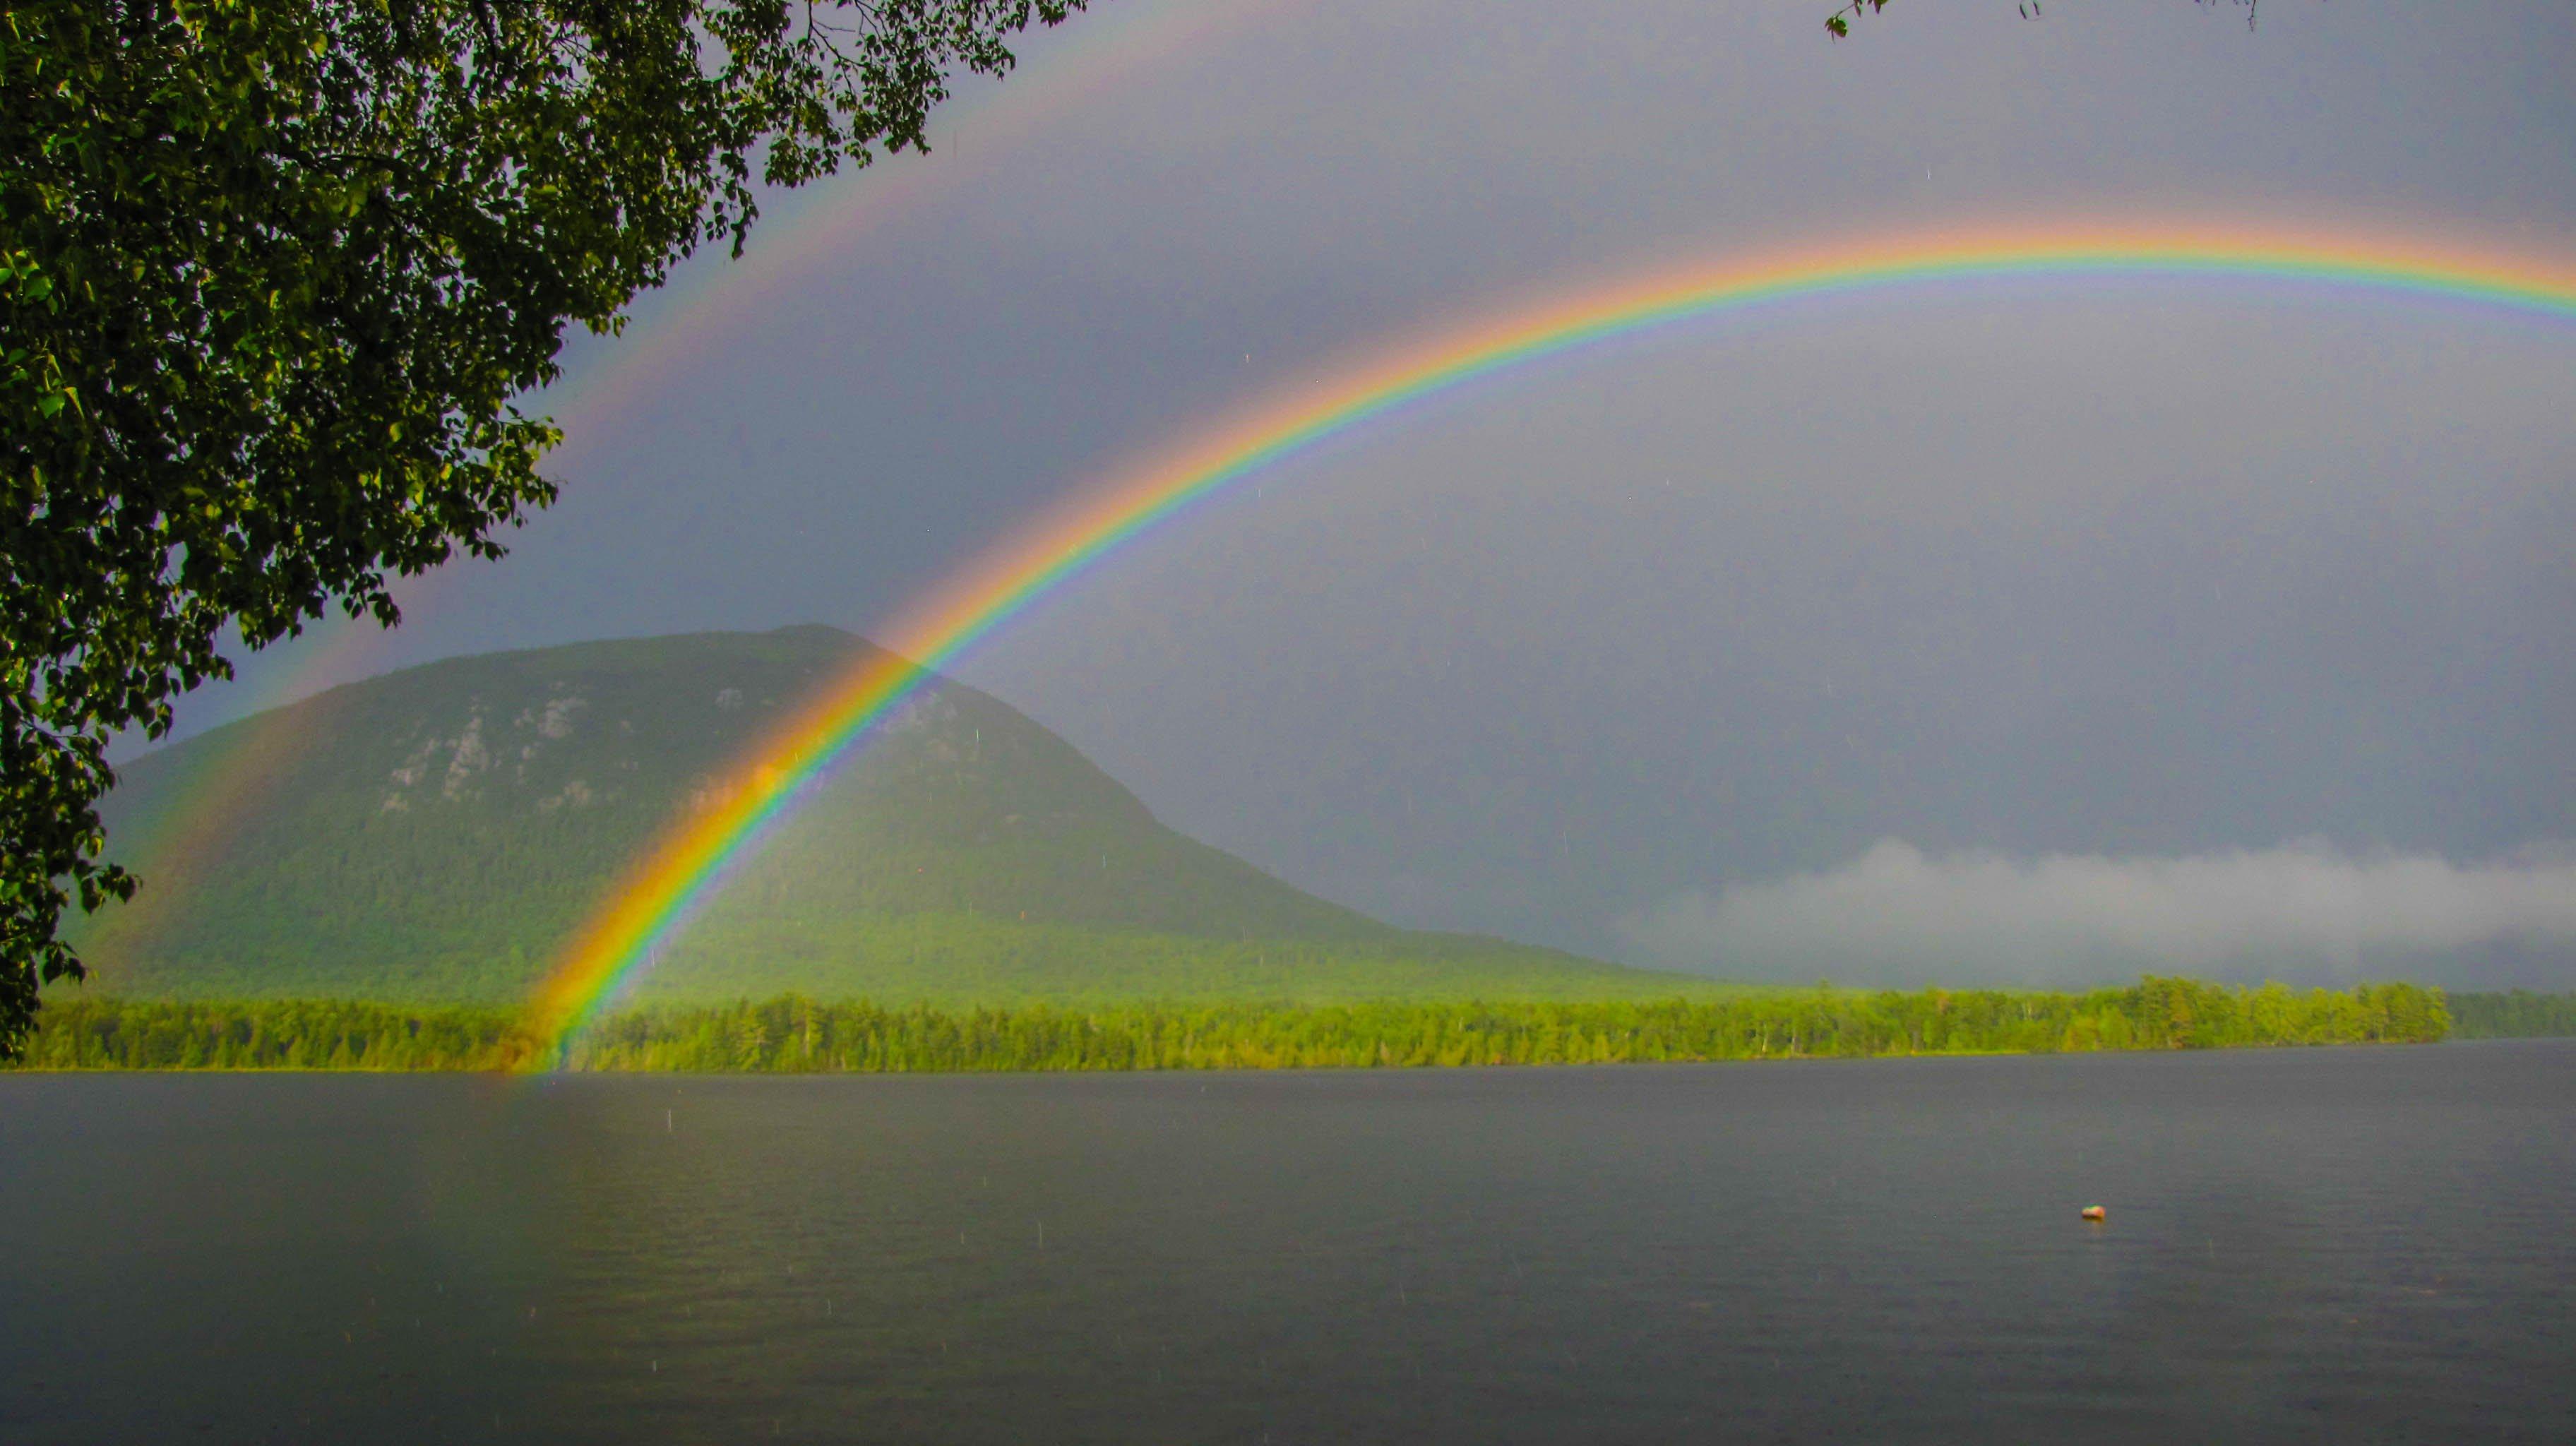 Double Rainbow over Kokadjoweemgwasebemsis (Little Spencer Mountain)